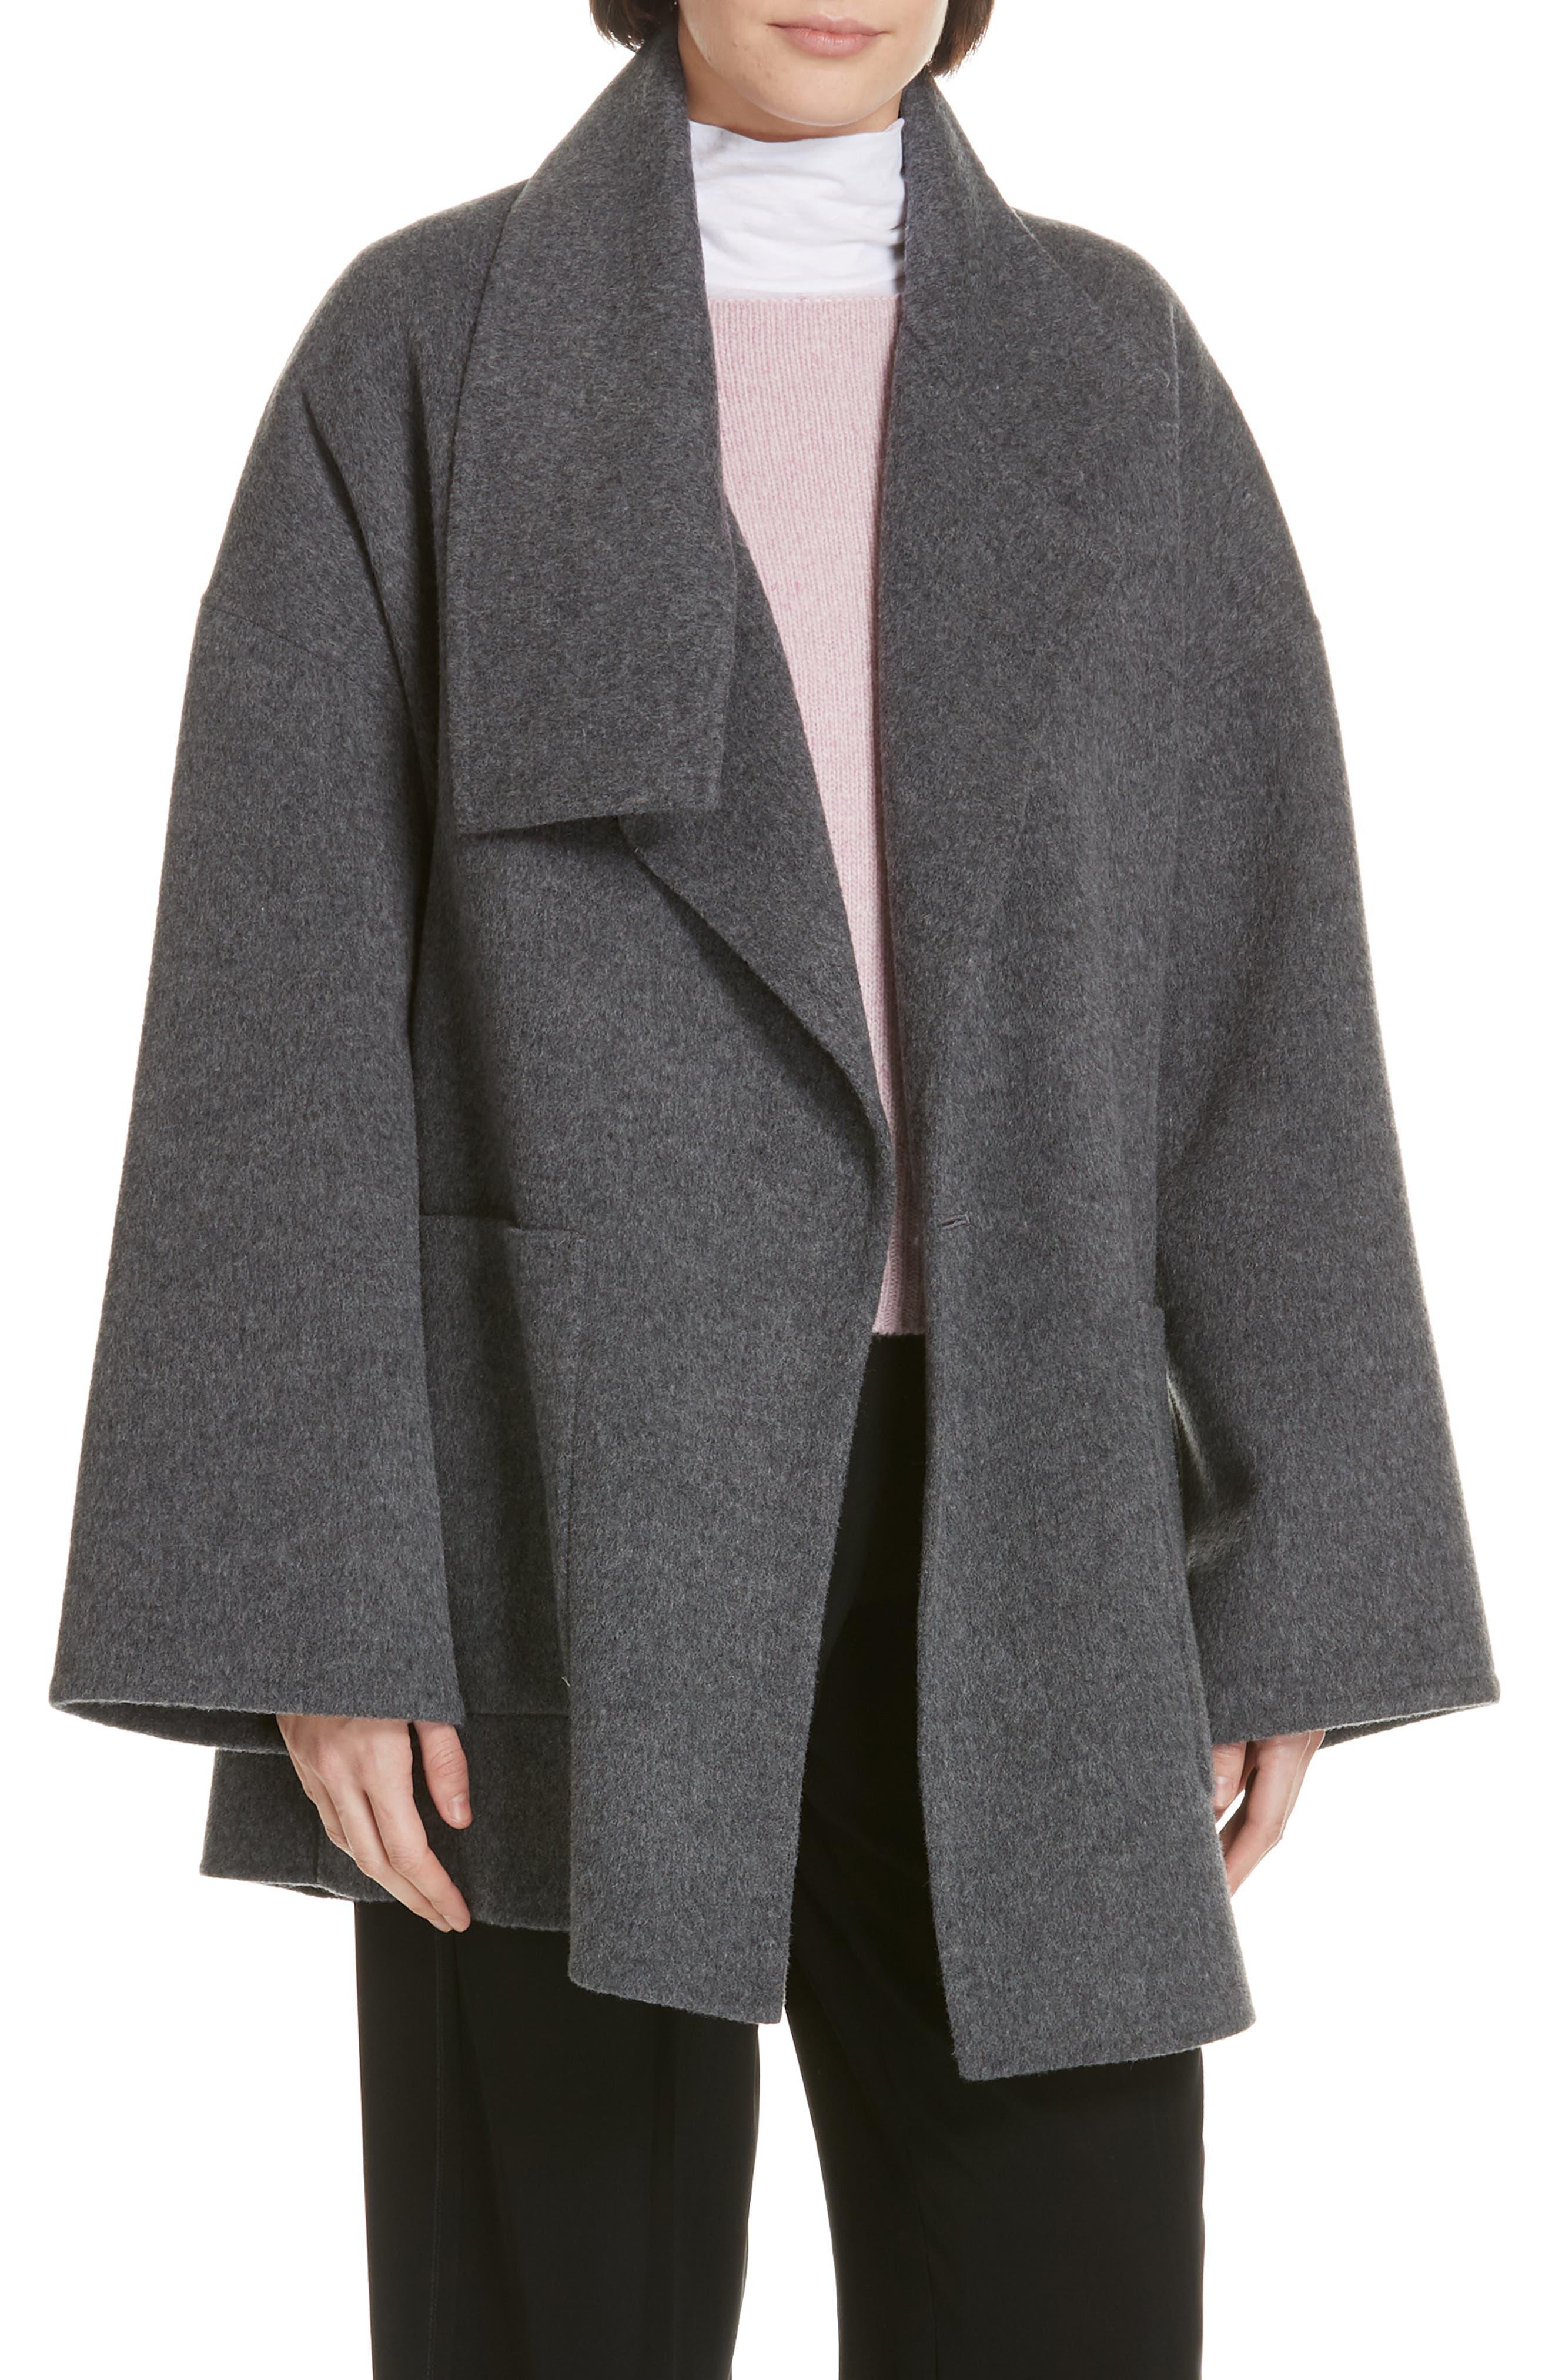 Blanket Coat,                             Main thumbnail 1, color,                             H GREY